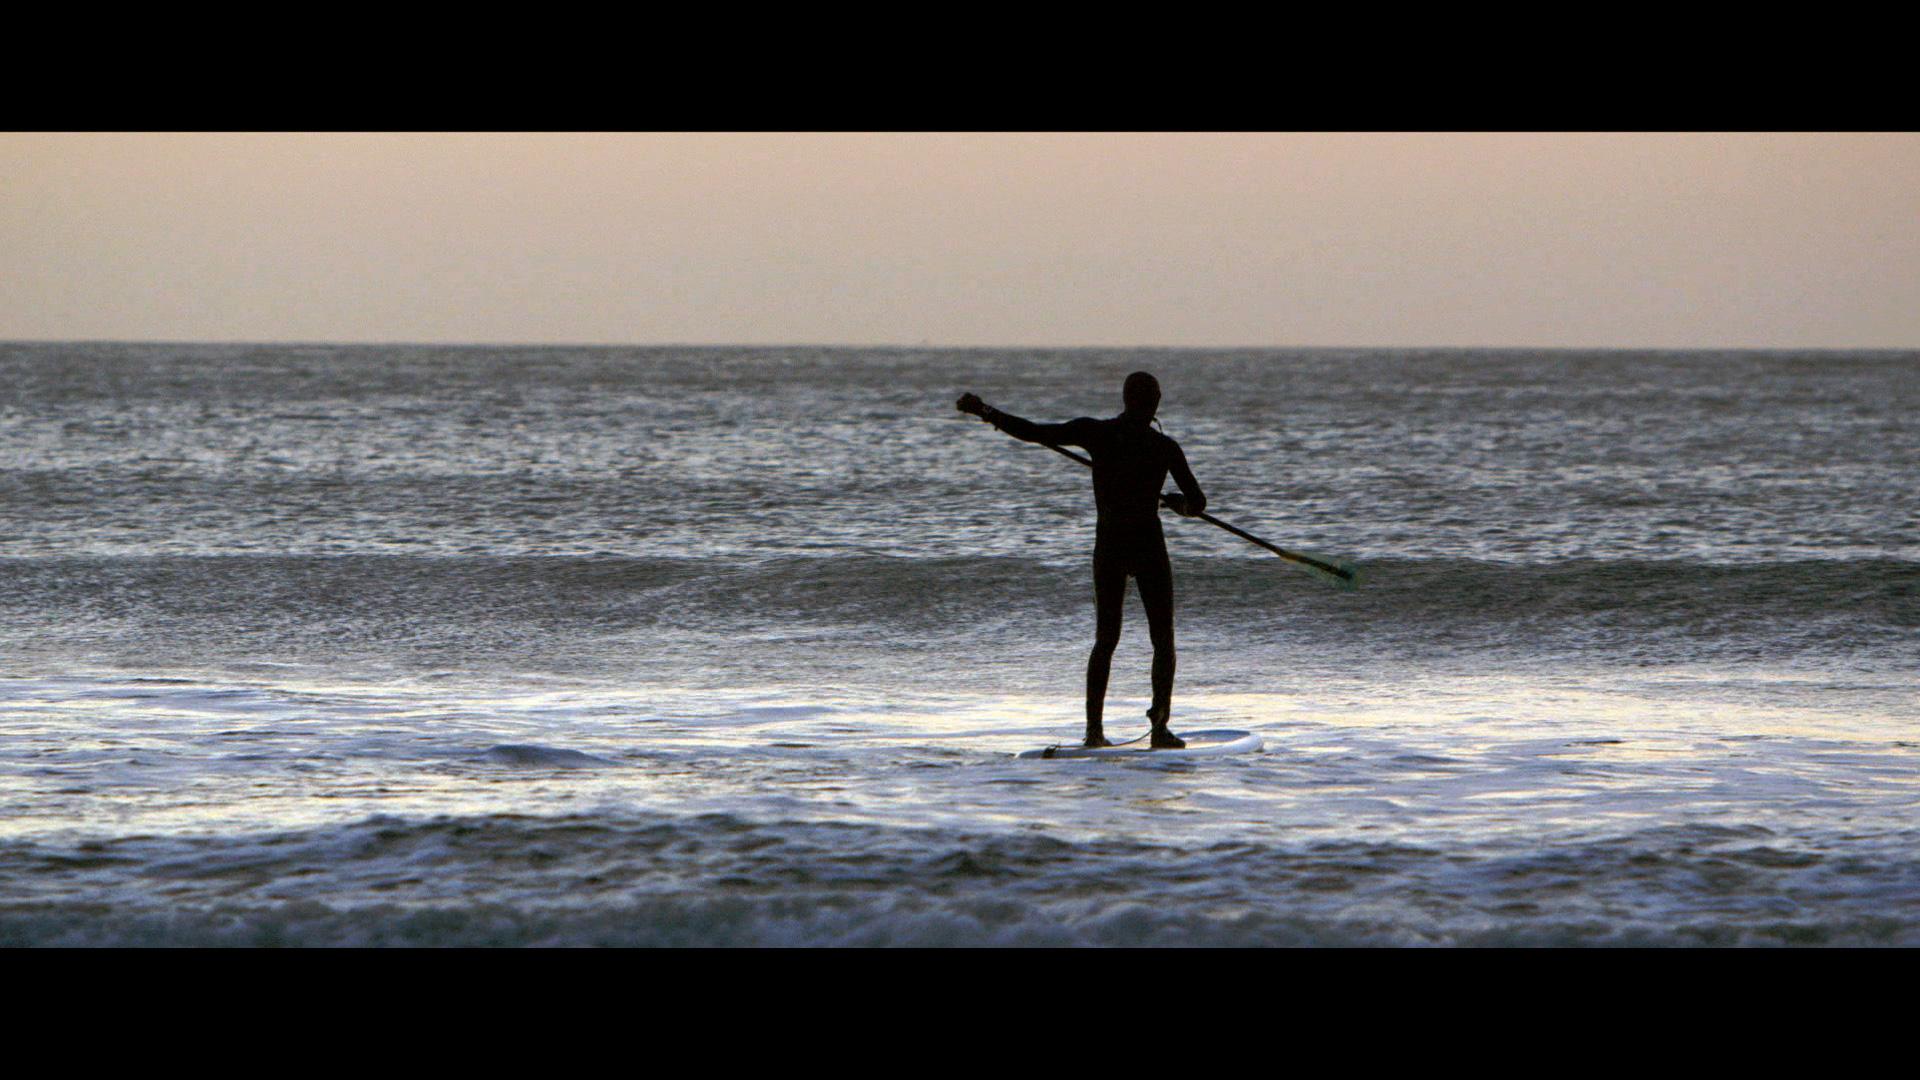 ocean-screen-03-hd.jpg